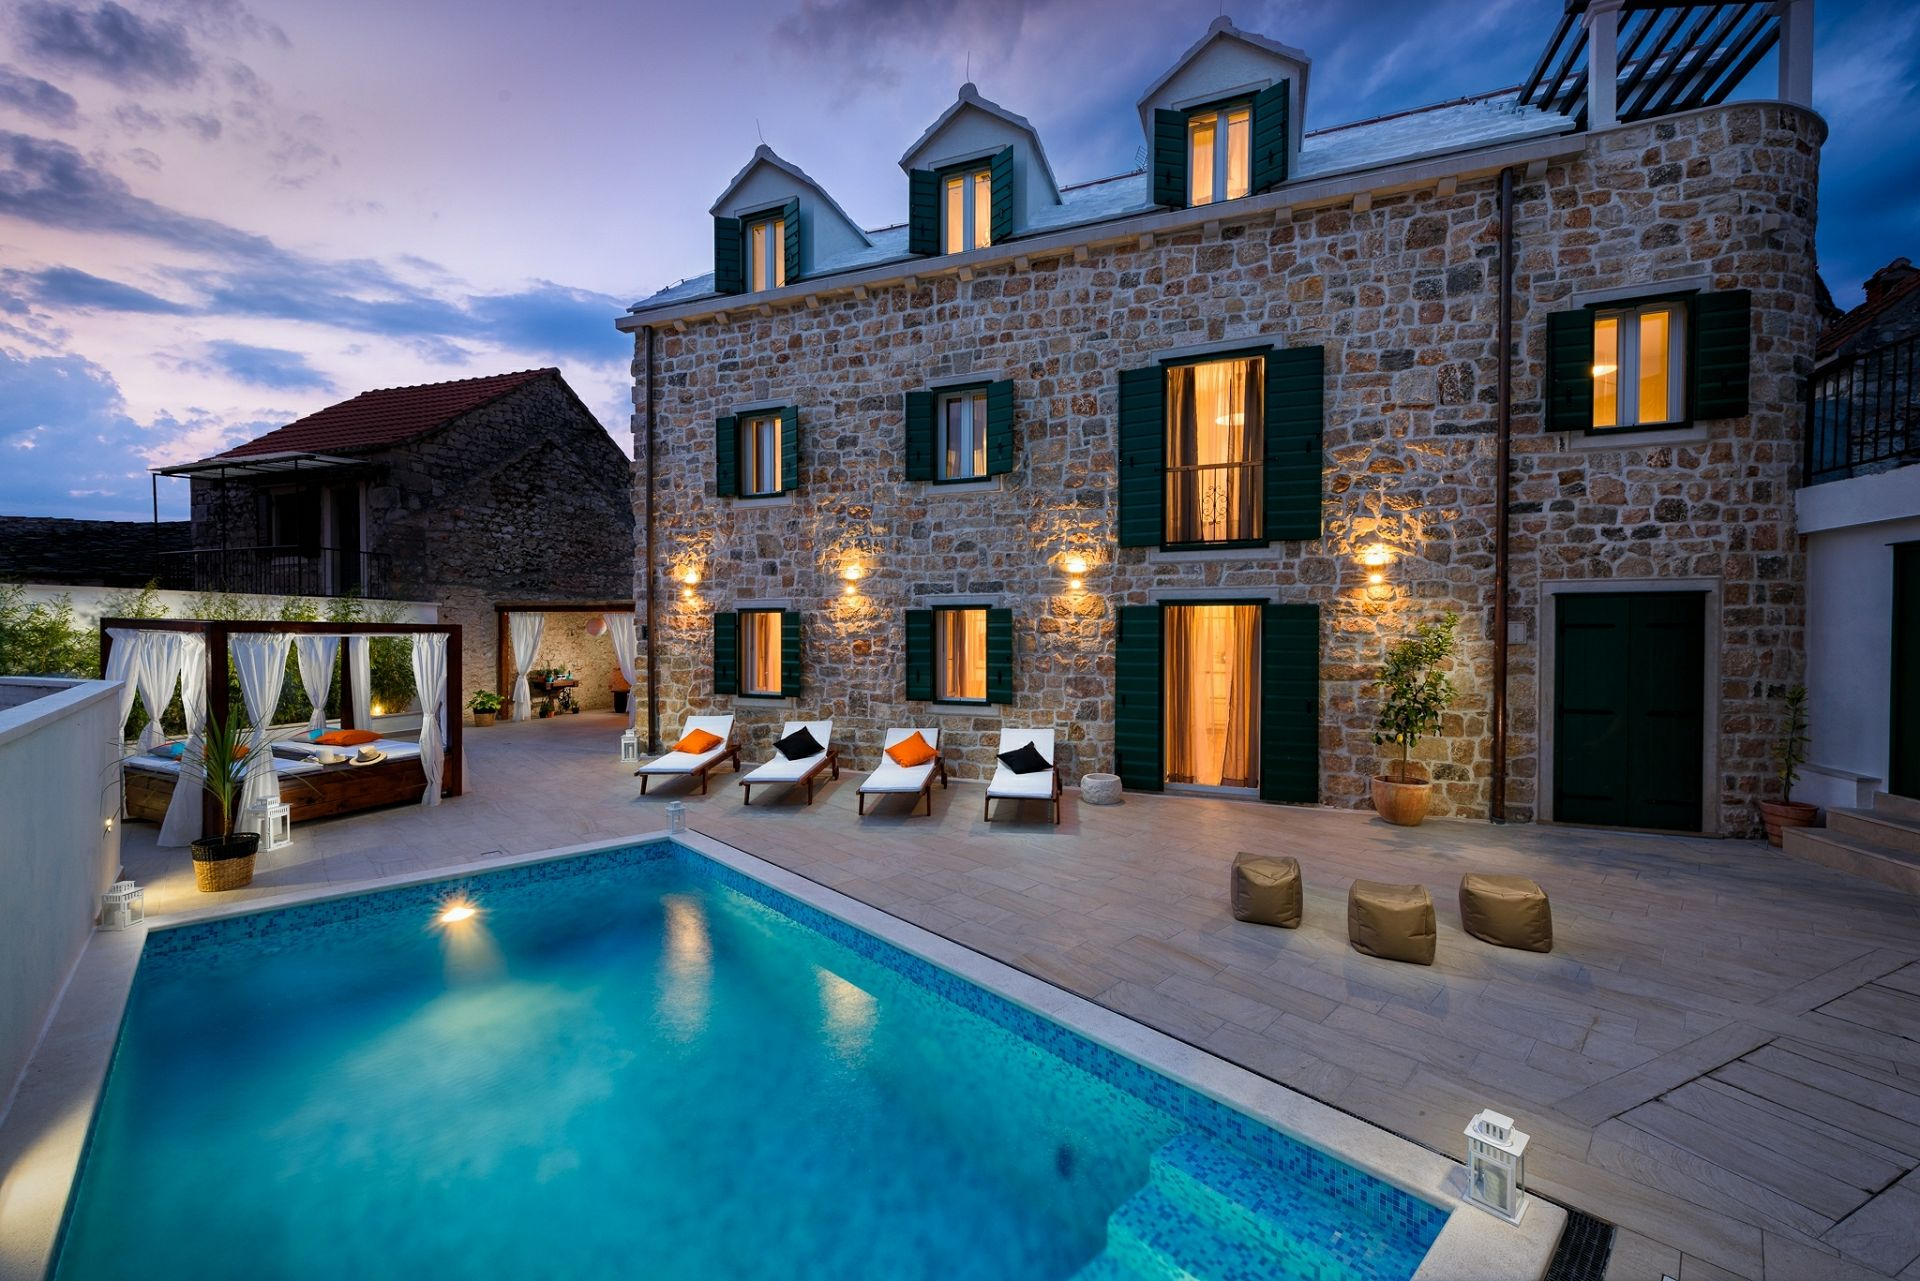 NM - Donji Humac - Vakantiehuizen, villa´s Kroatië